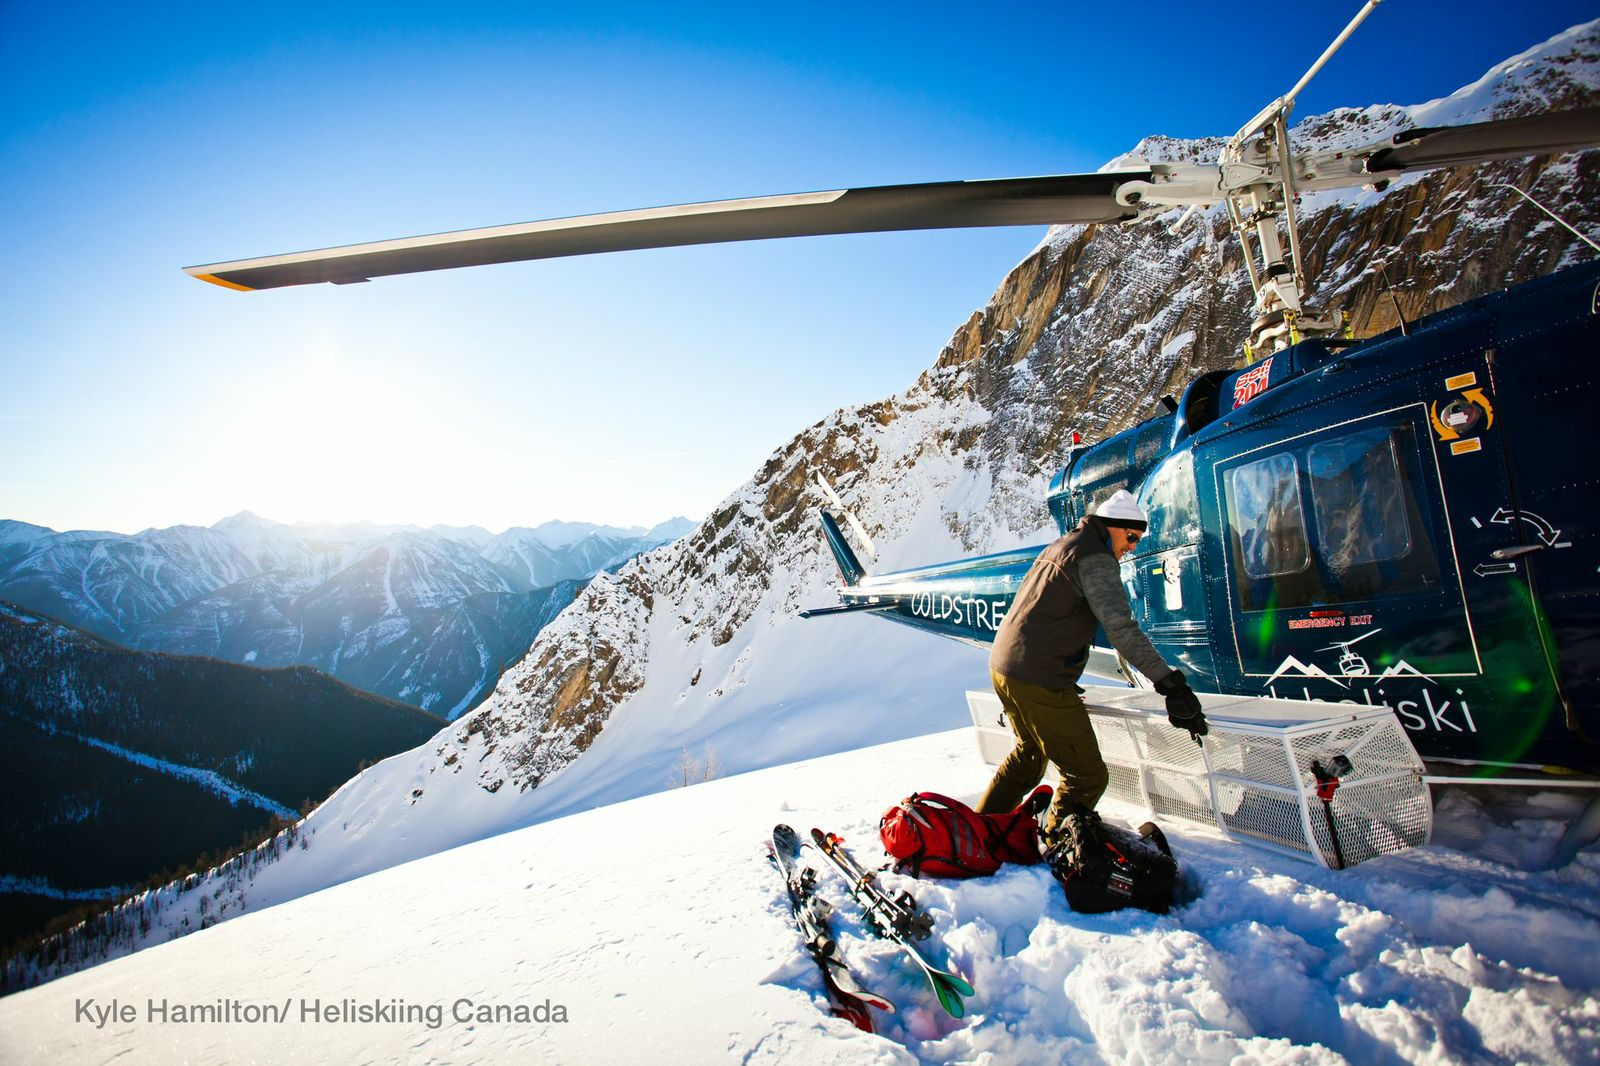 Ready voor take off? Heb je altijd al willen helikopter skiën in Canada, vraag  je offerte aan bij wintersportcanadaamerika